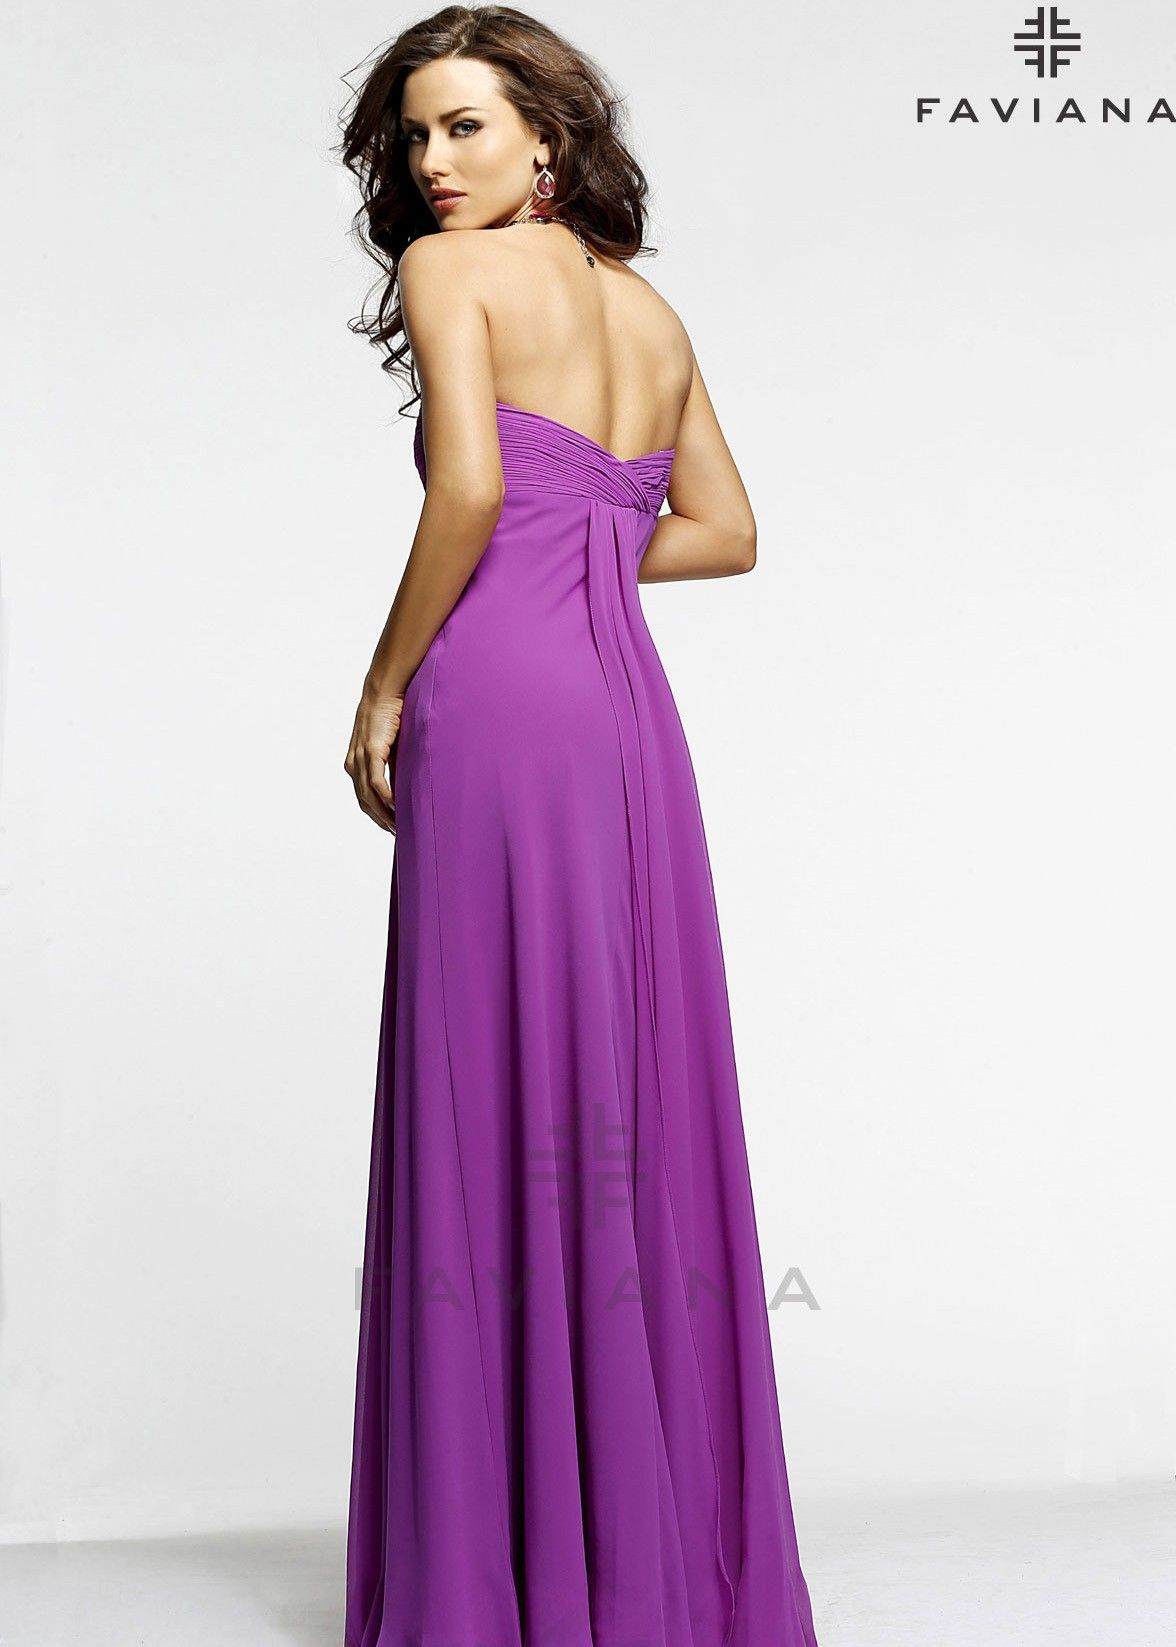 Faviana 7339 Ruched Chiffon Gown Dresses, Faviana prom